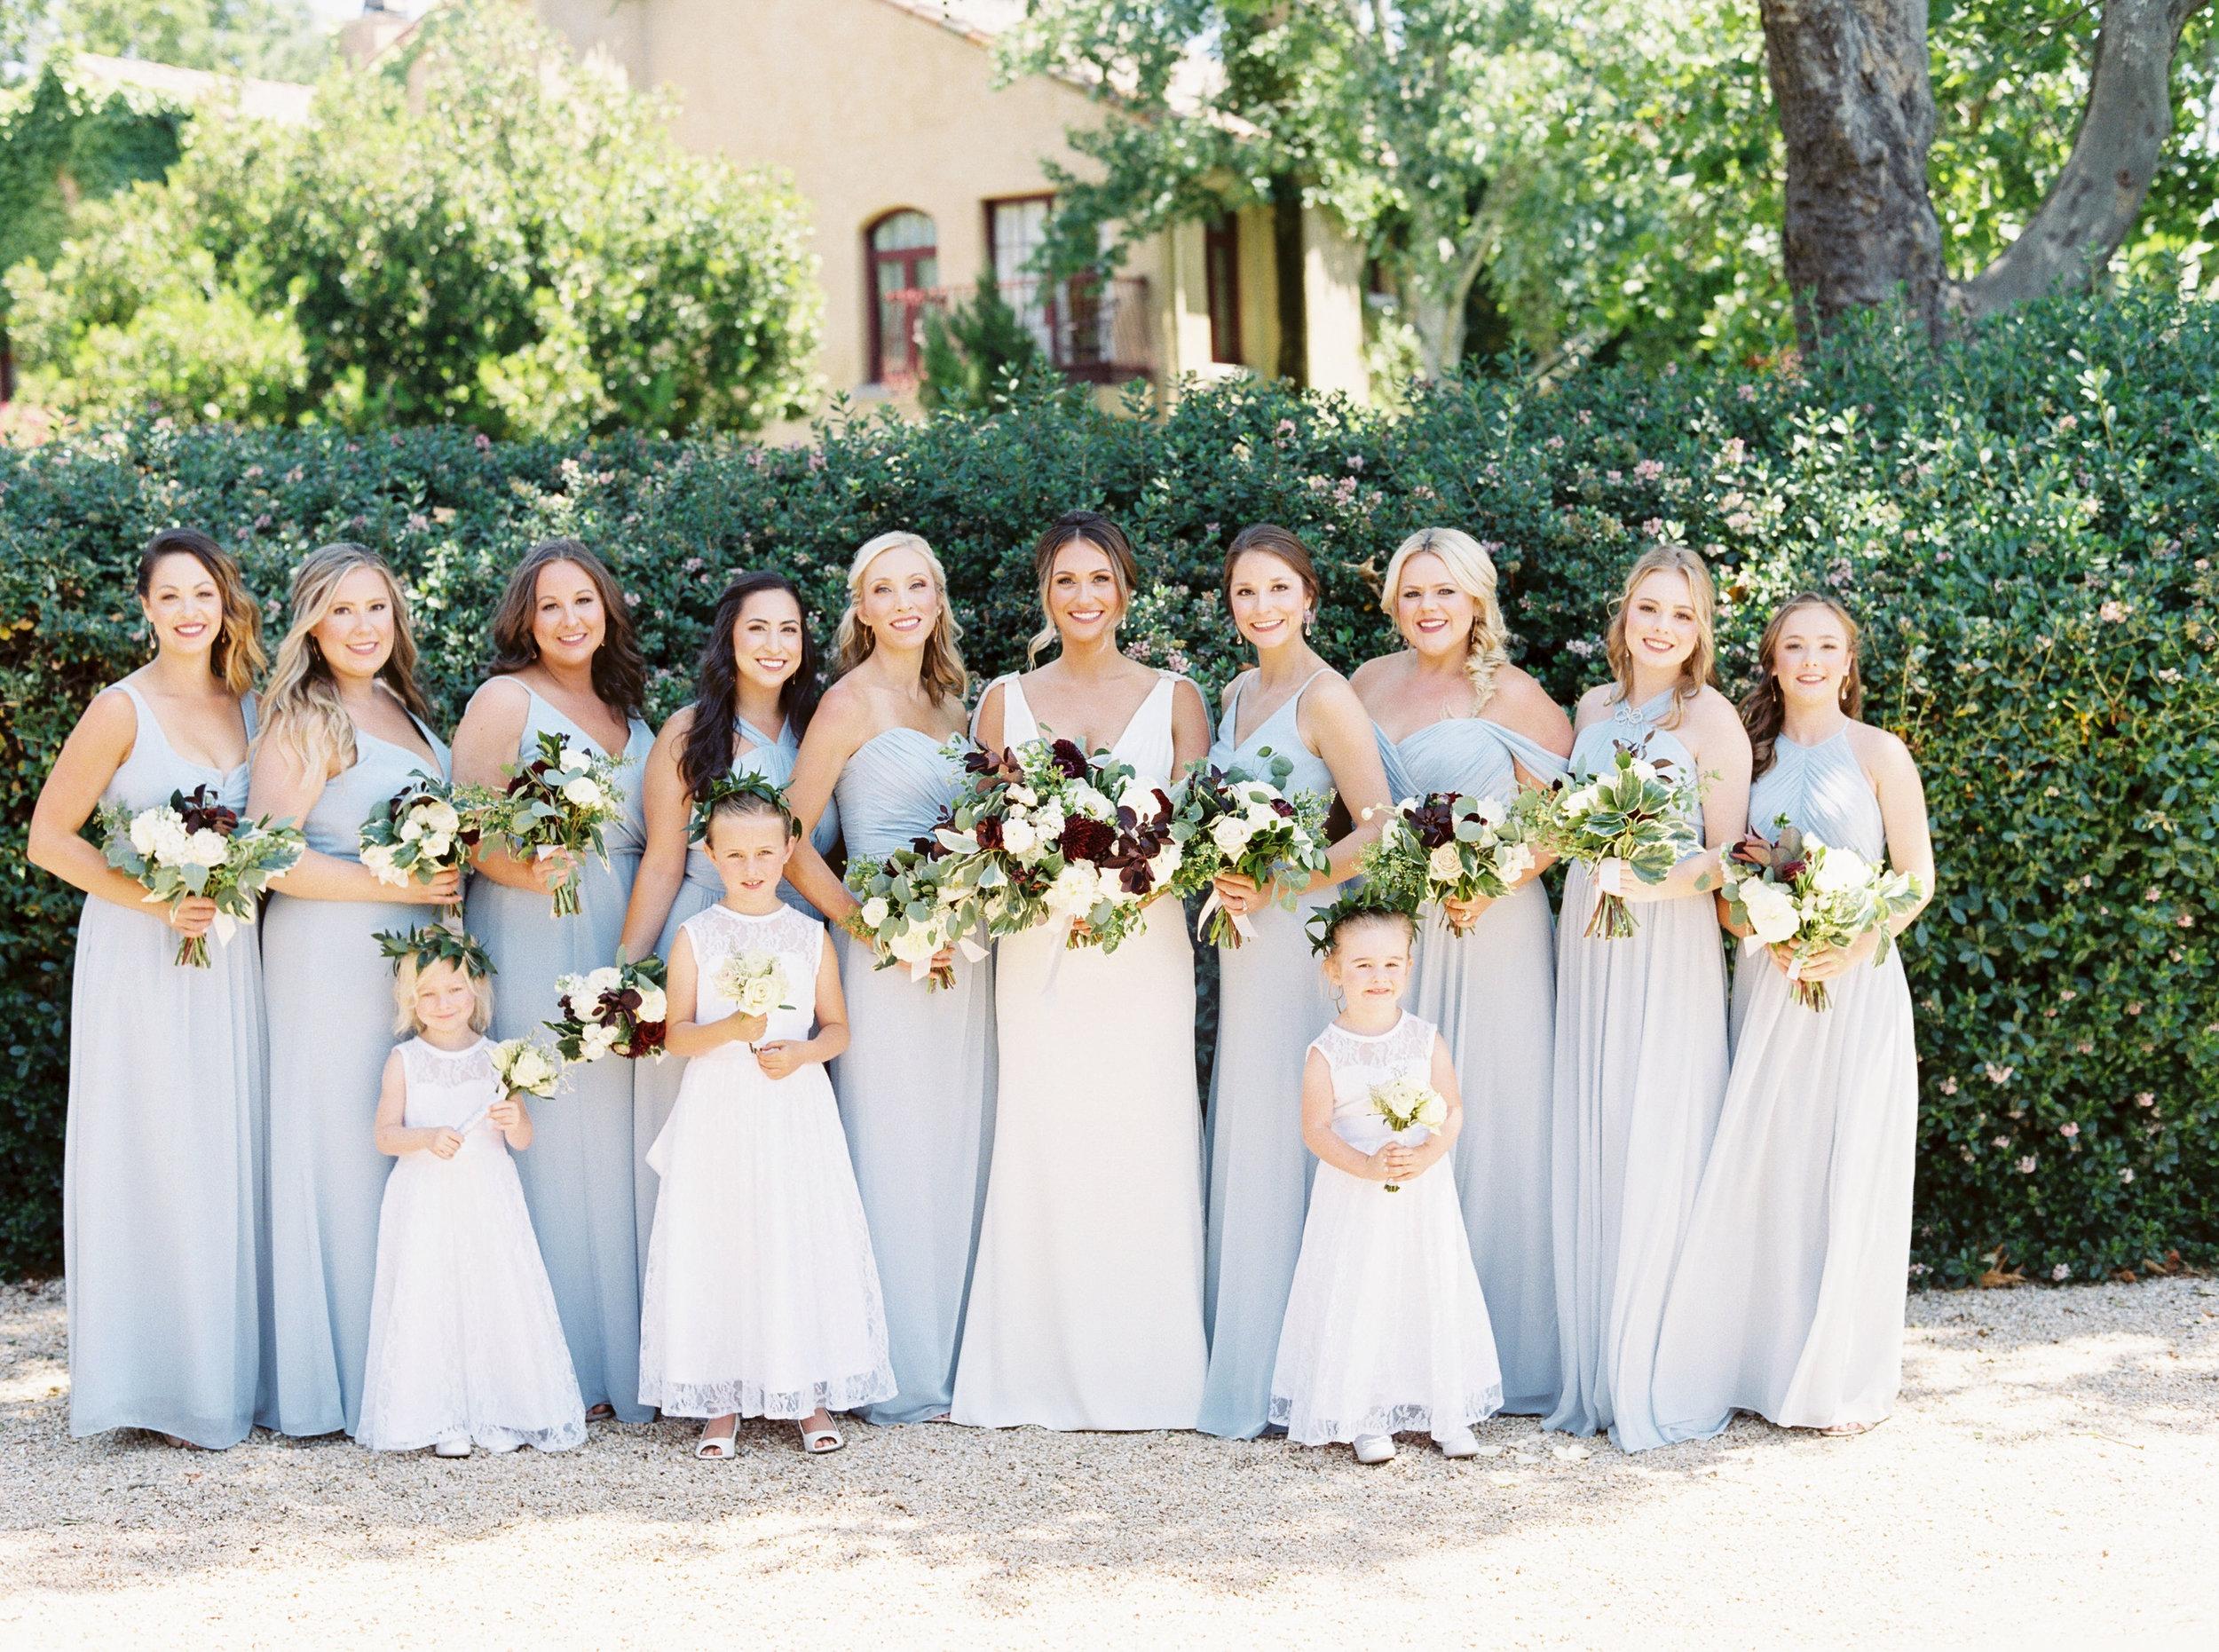 vintners-inn-wedding-in-santa-rosa-california-142.jpg